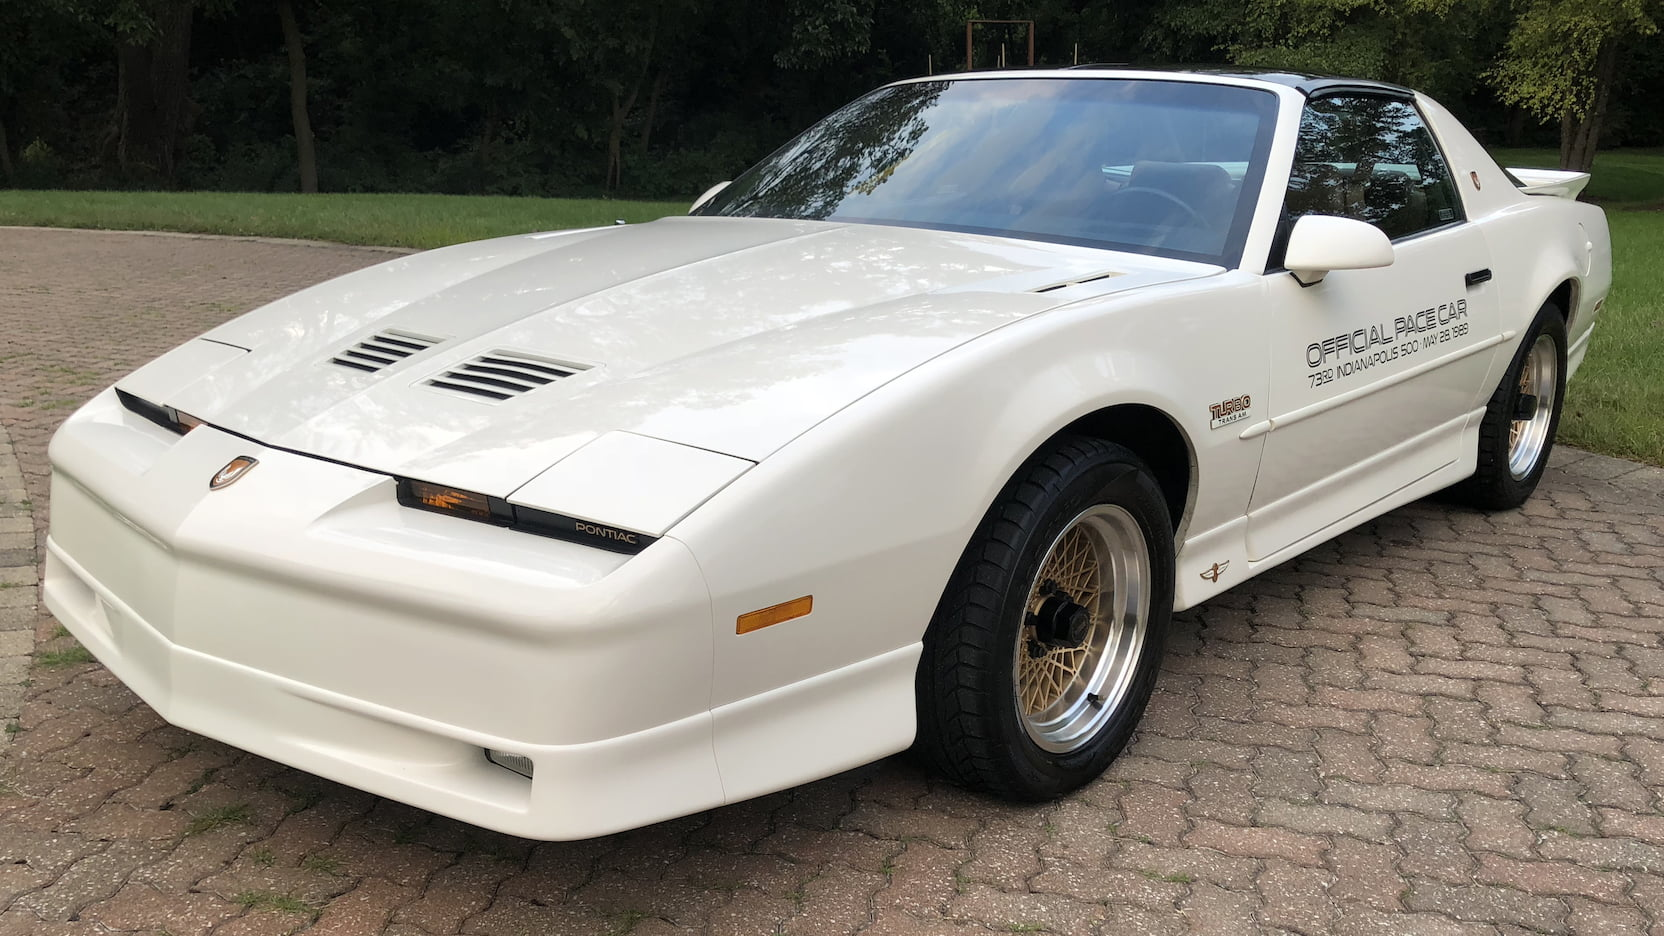 1989 Pontiac Firebird Trans Am 20th Anniversary